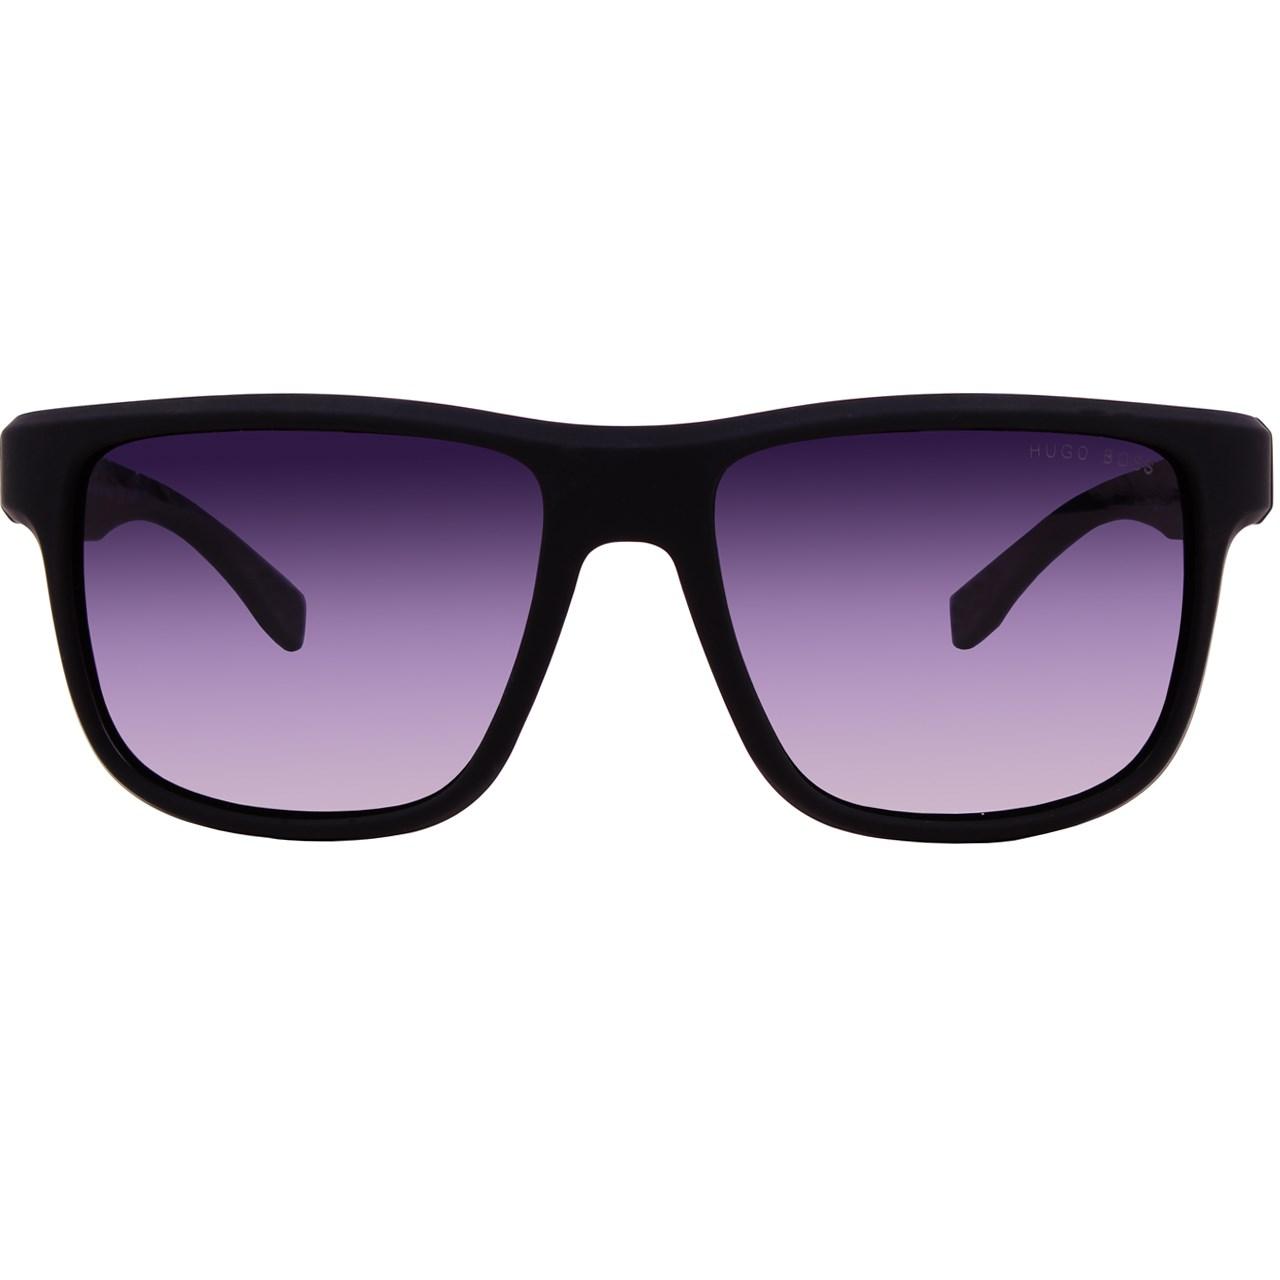 عینک آفتابی   کد BO 0799/S